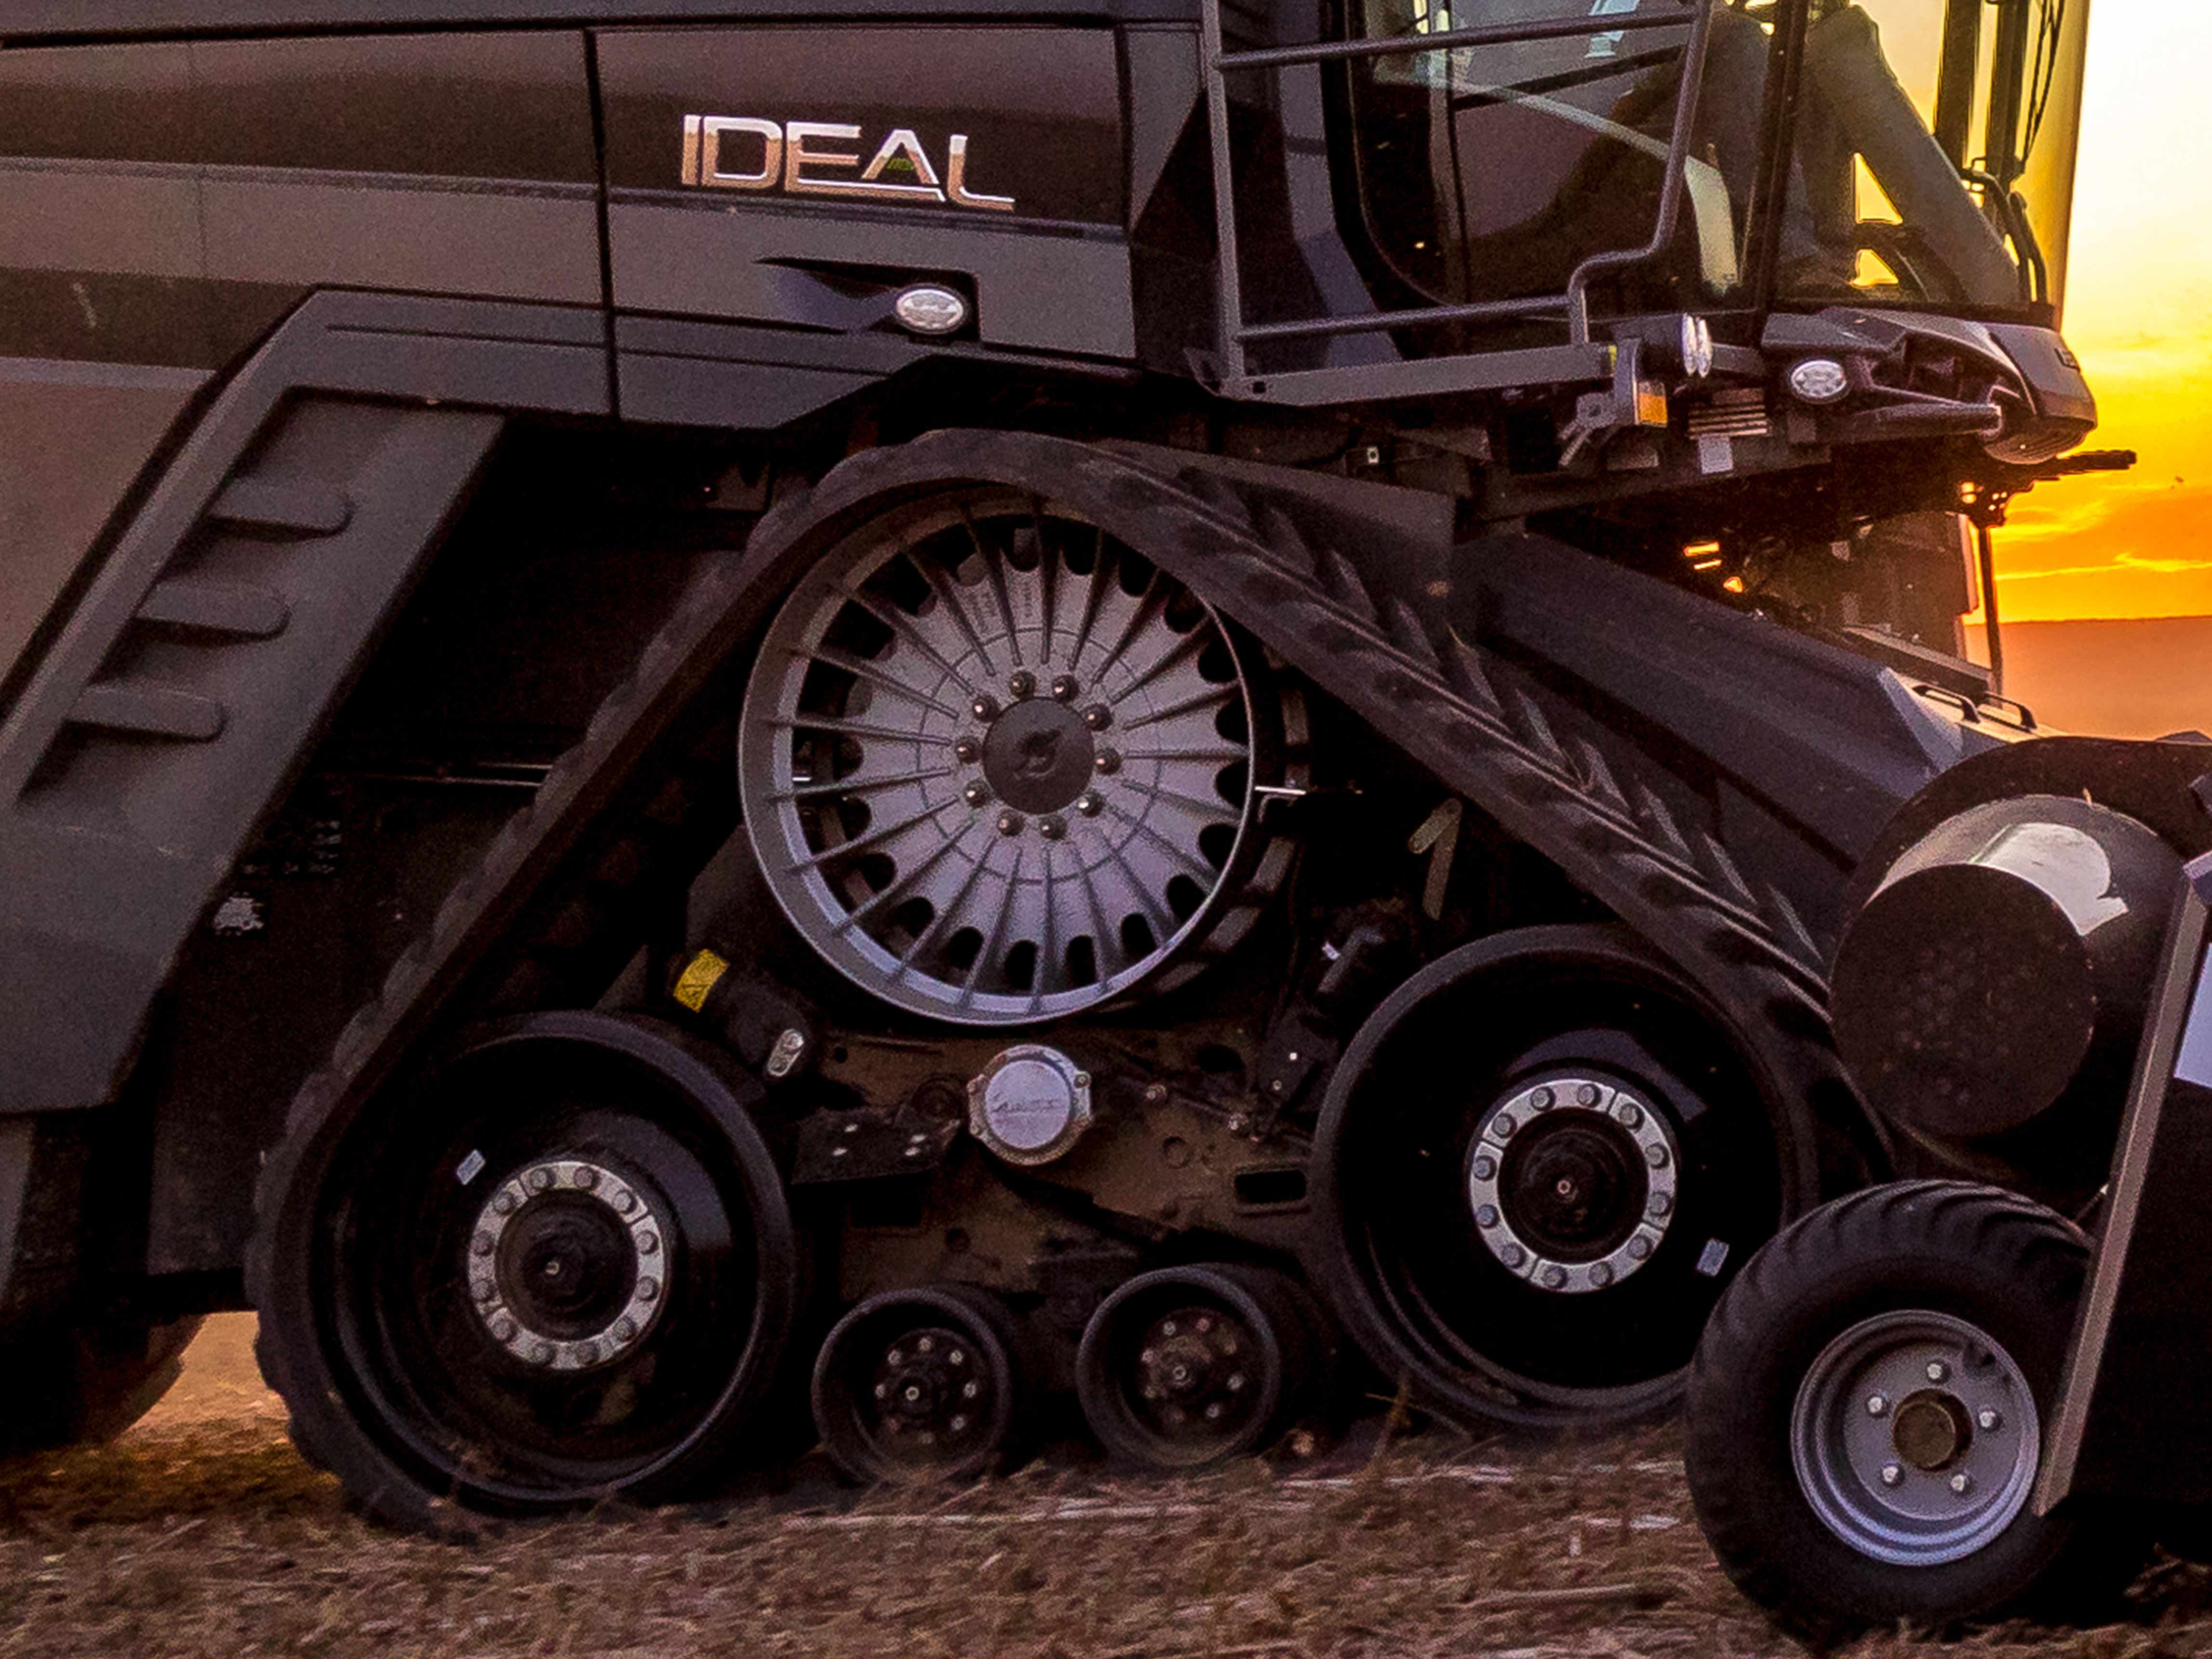 Fendt IDEAL Combine TrakRide System